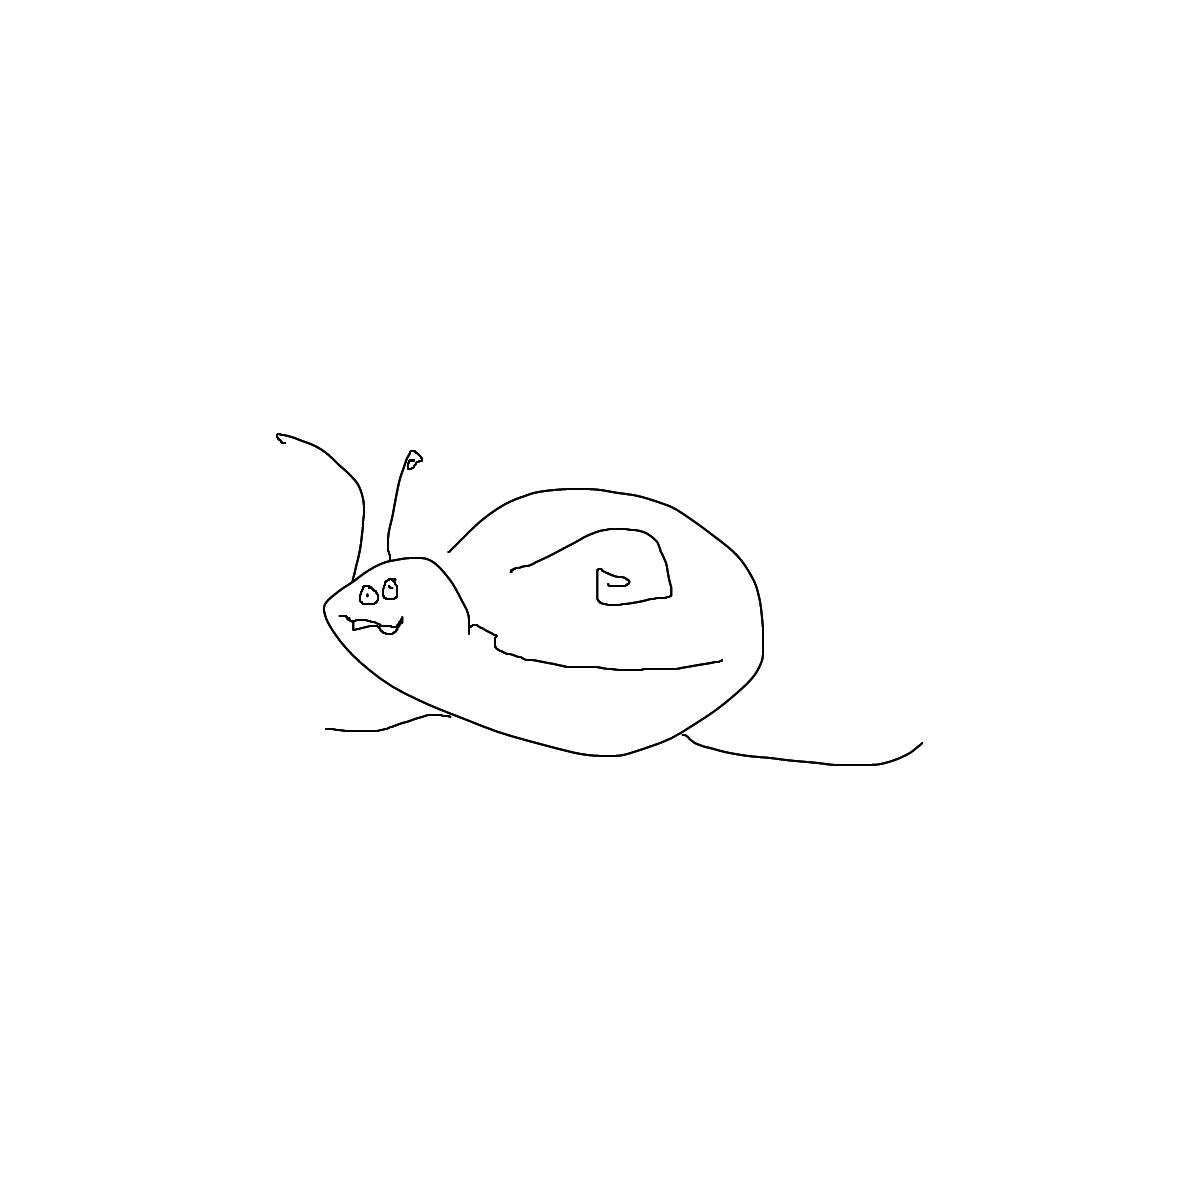 BAAAM drawing#301 lat:41.1716117858886700lng: -8.6121015548706050